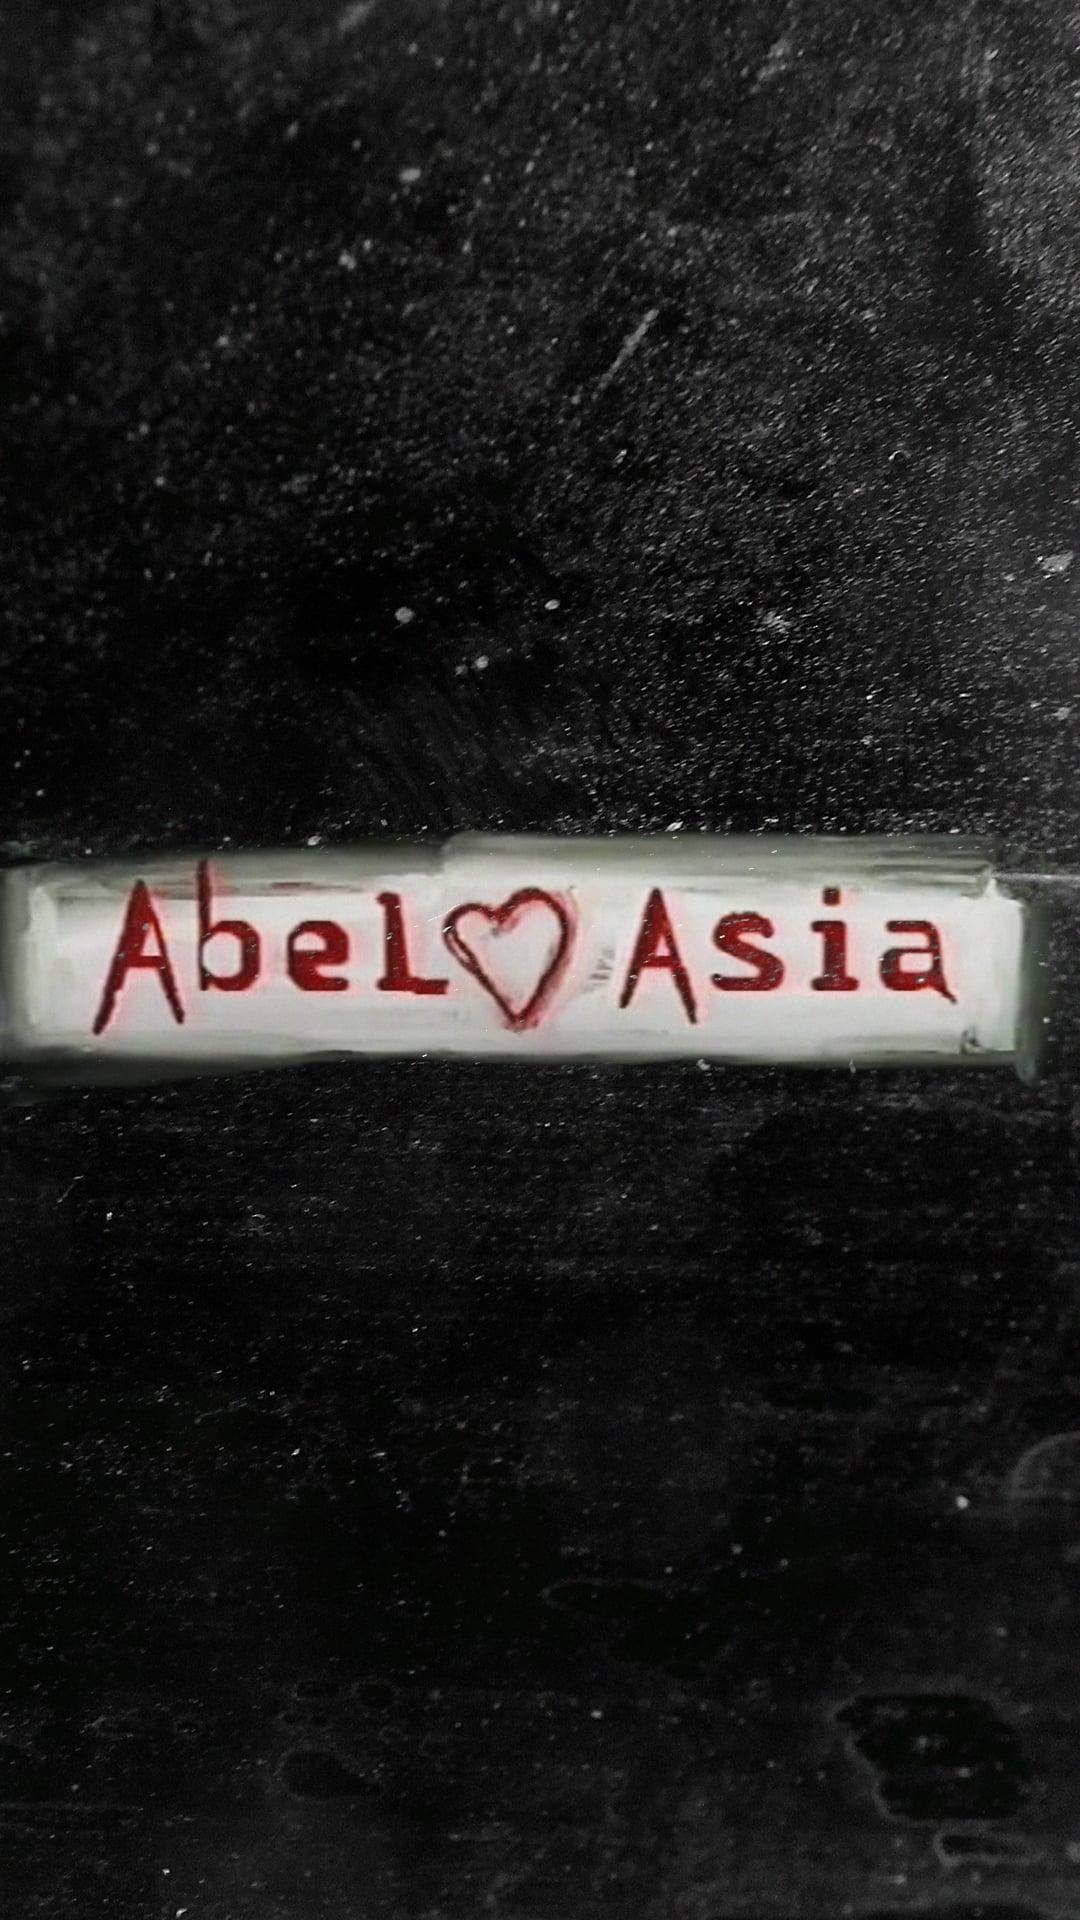 Abel/Asia